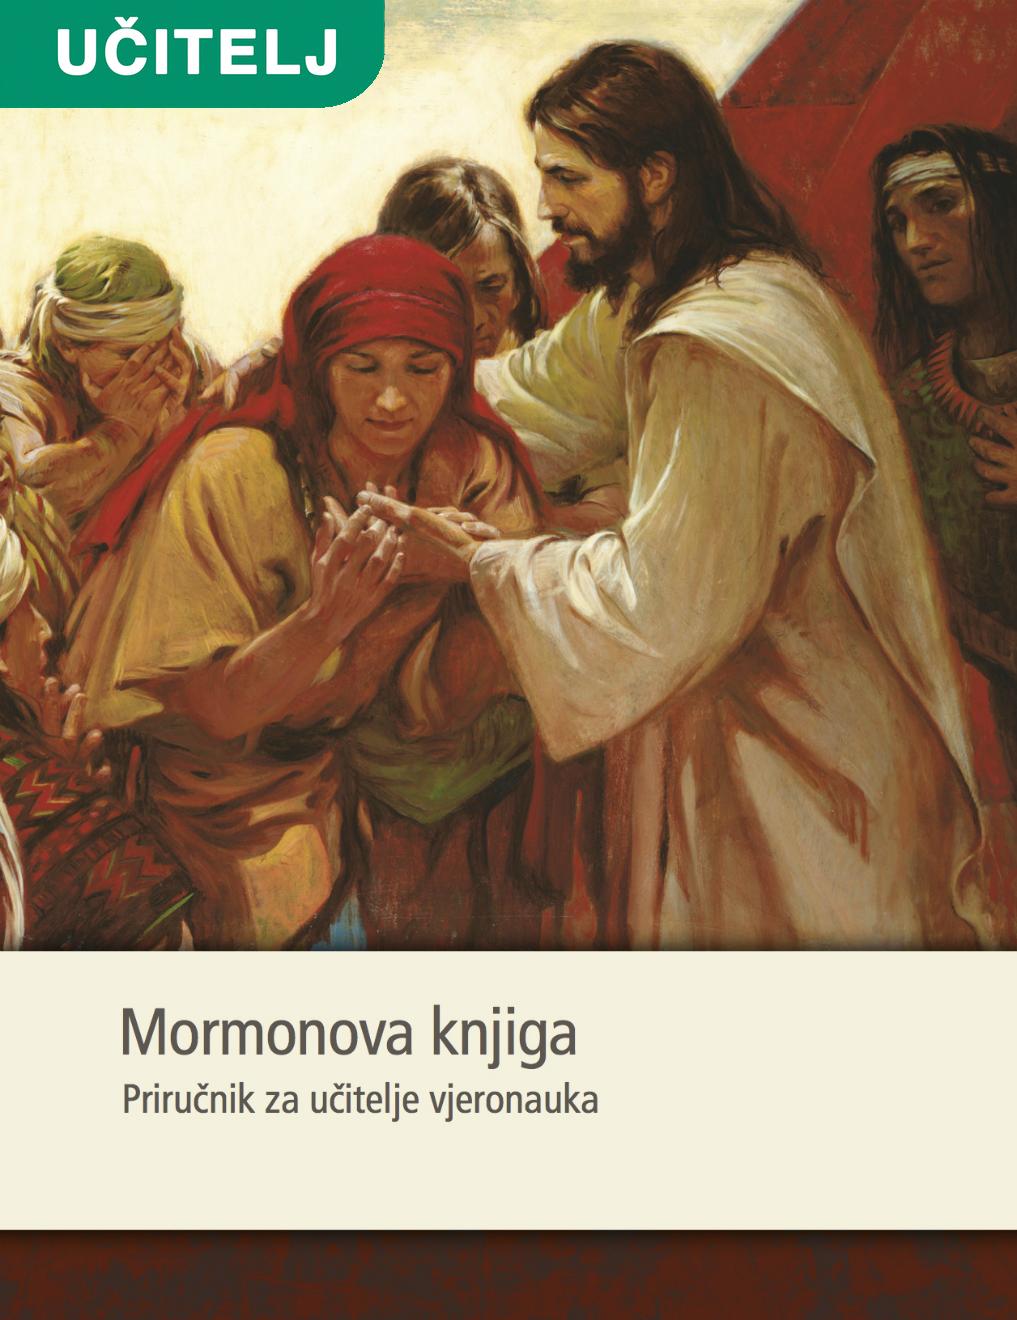 Mormonova knjiga – priručnik za učitelja vjeronauka